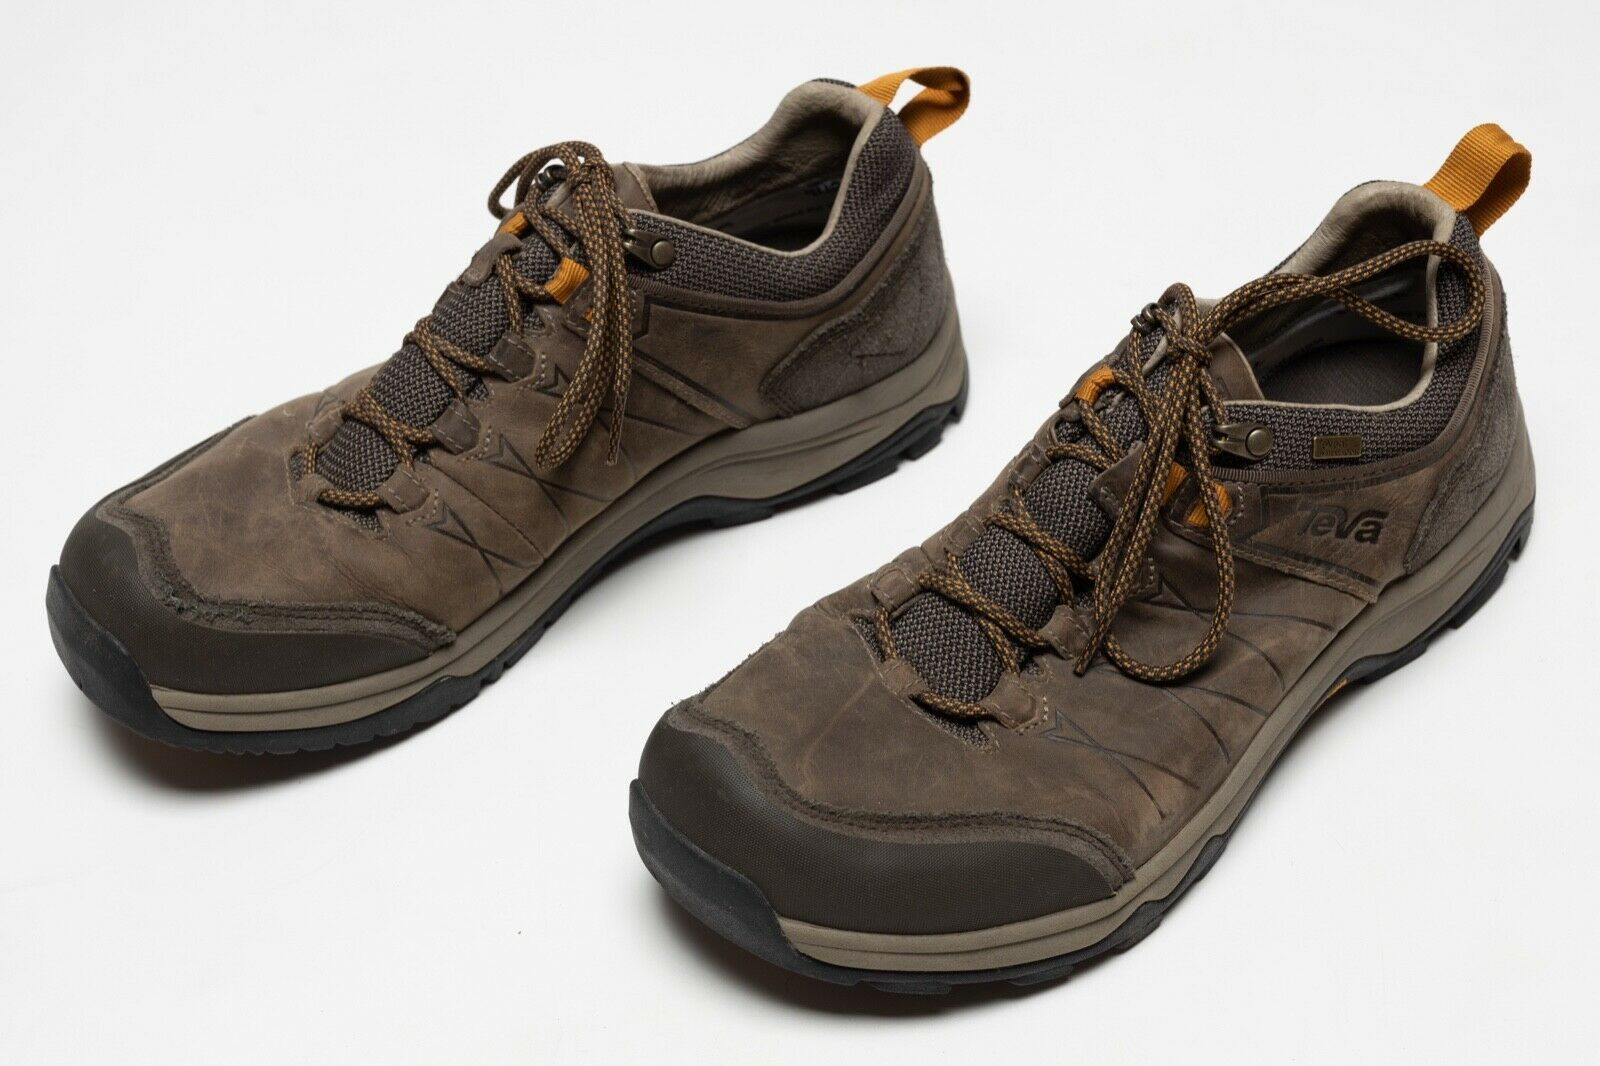 Mens Teva Arrowood Riva Low WP Waterproof Hiking Shoes Walnut Size US 11